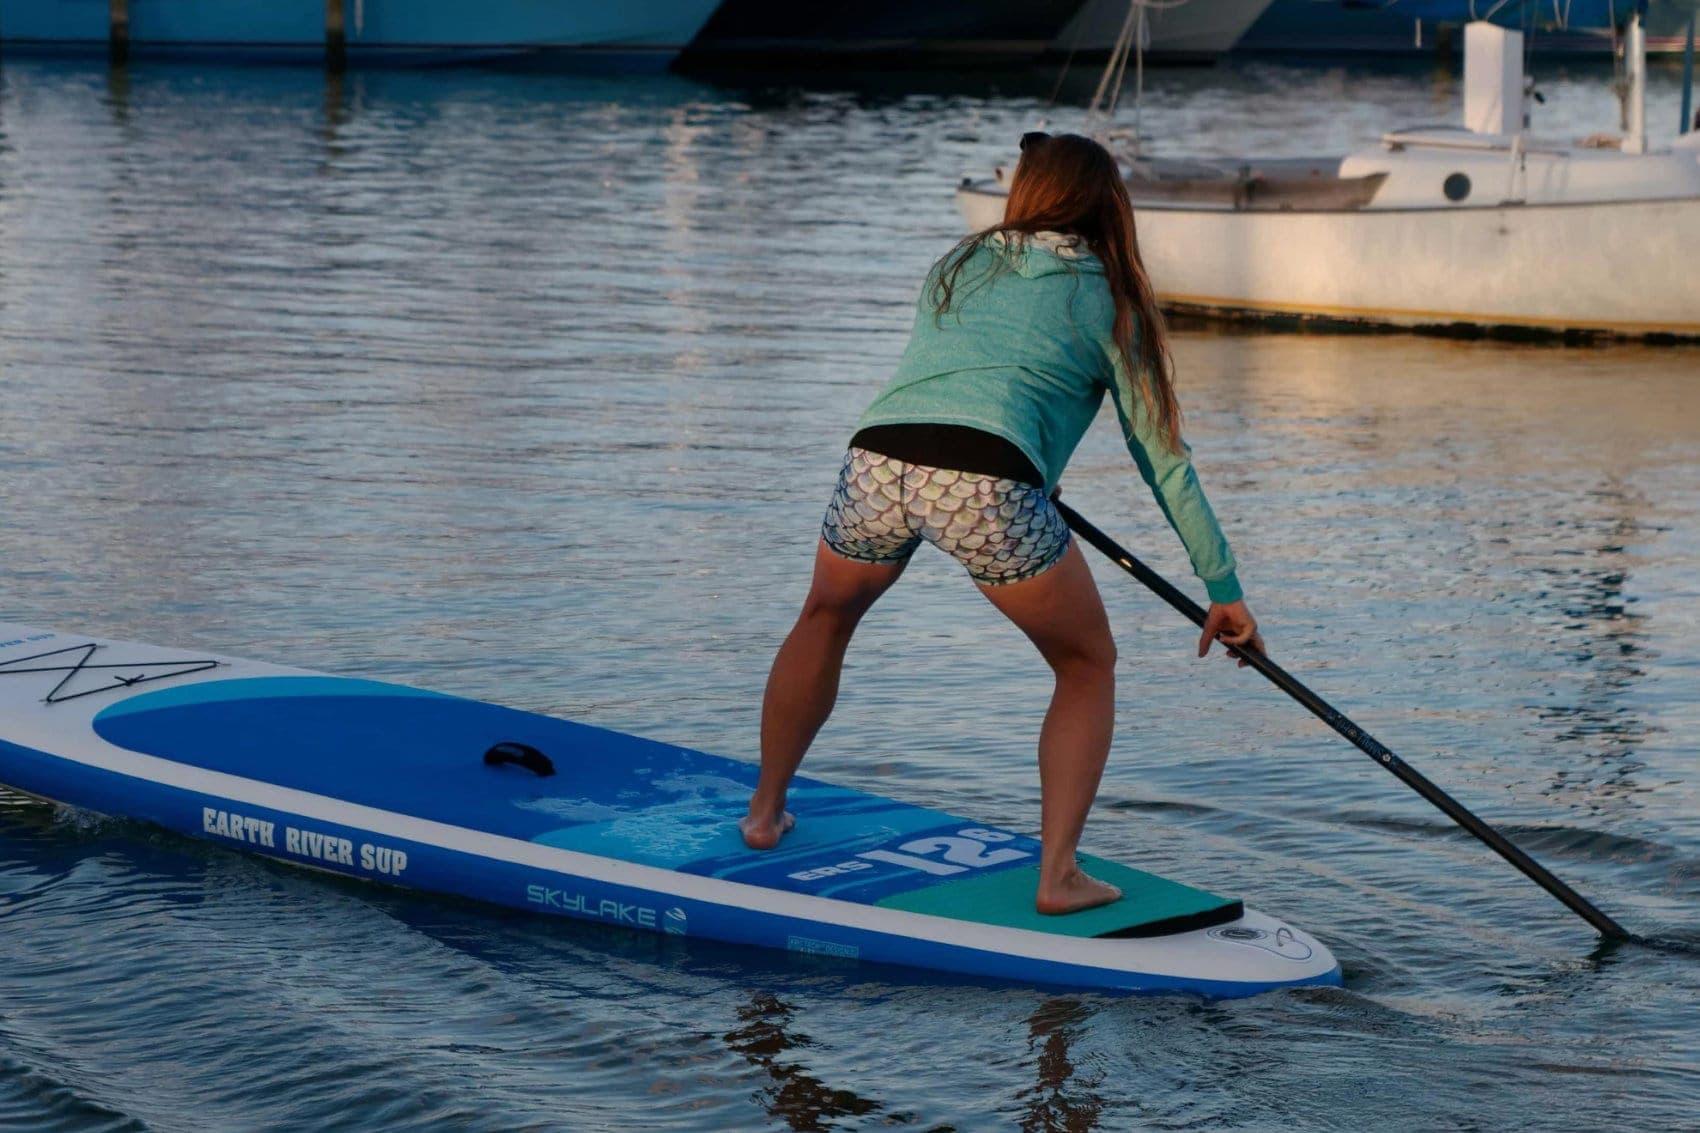 Woman Paddling Earth River SUP 12-6 SKYLAKE BLUE